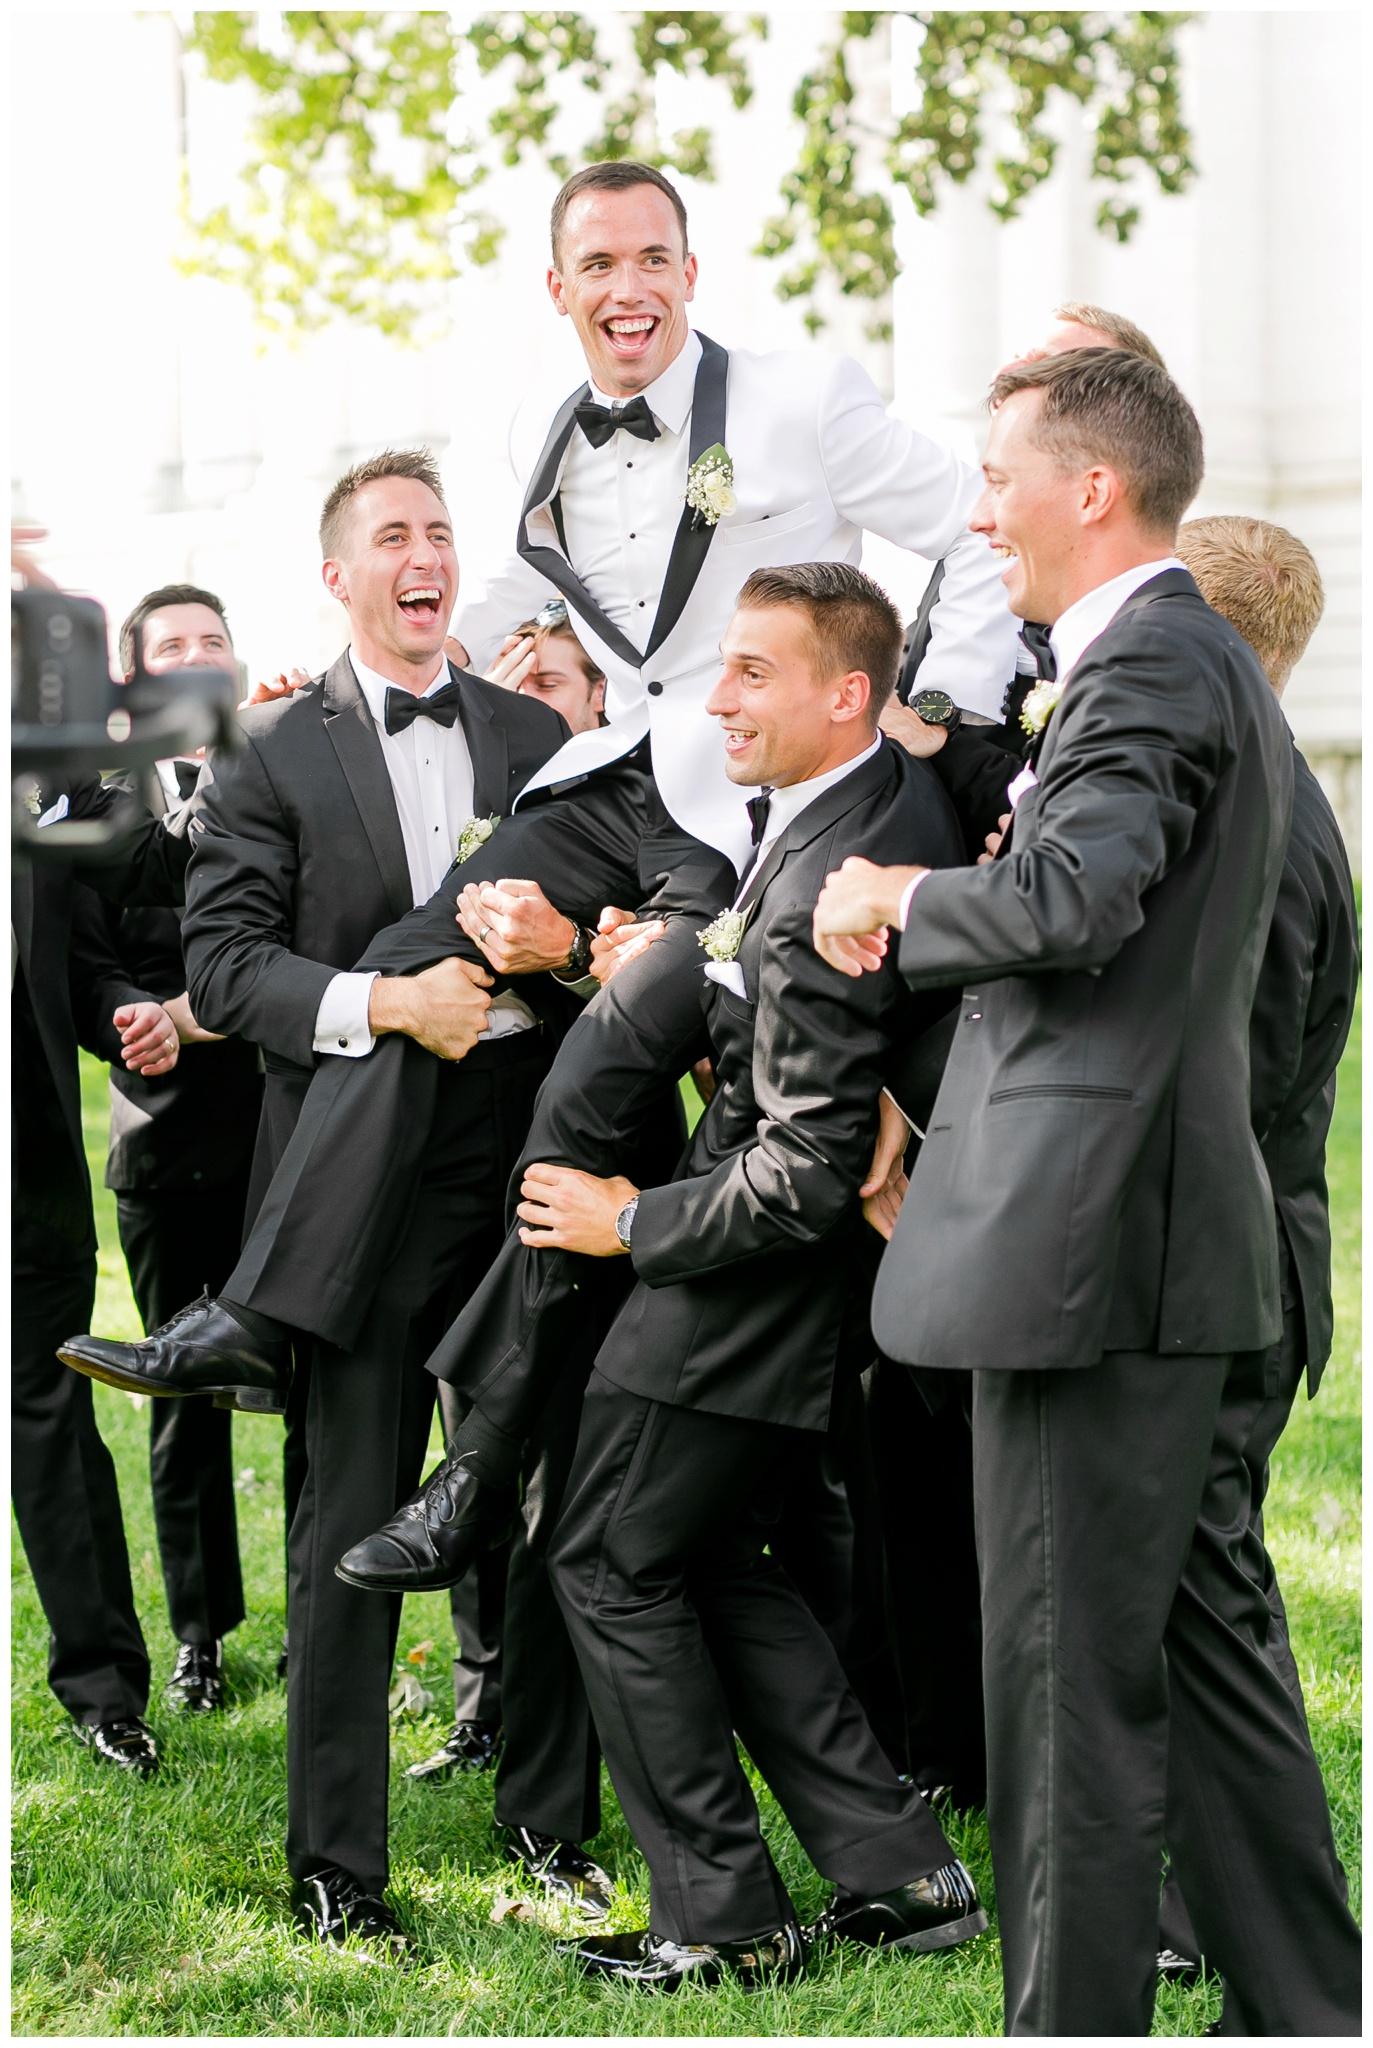 UW_Memorial_Union_wedding_madison_wisconsin_wedding_photographers_4620.jpg